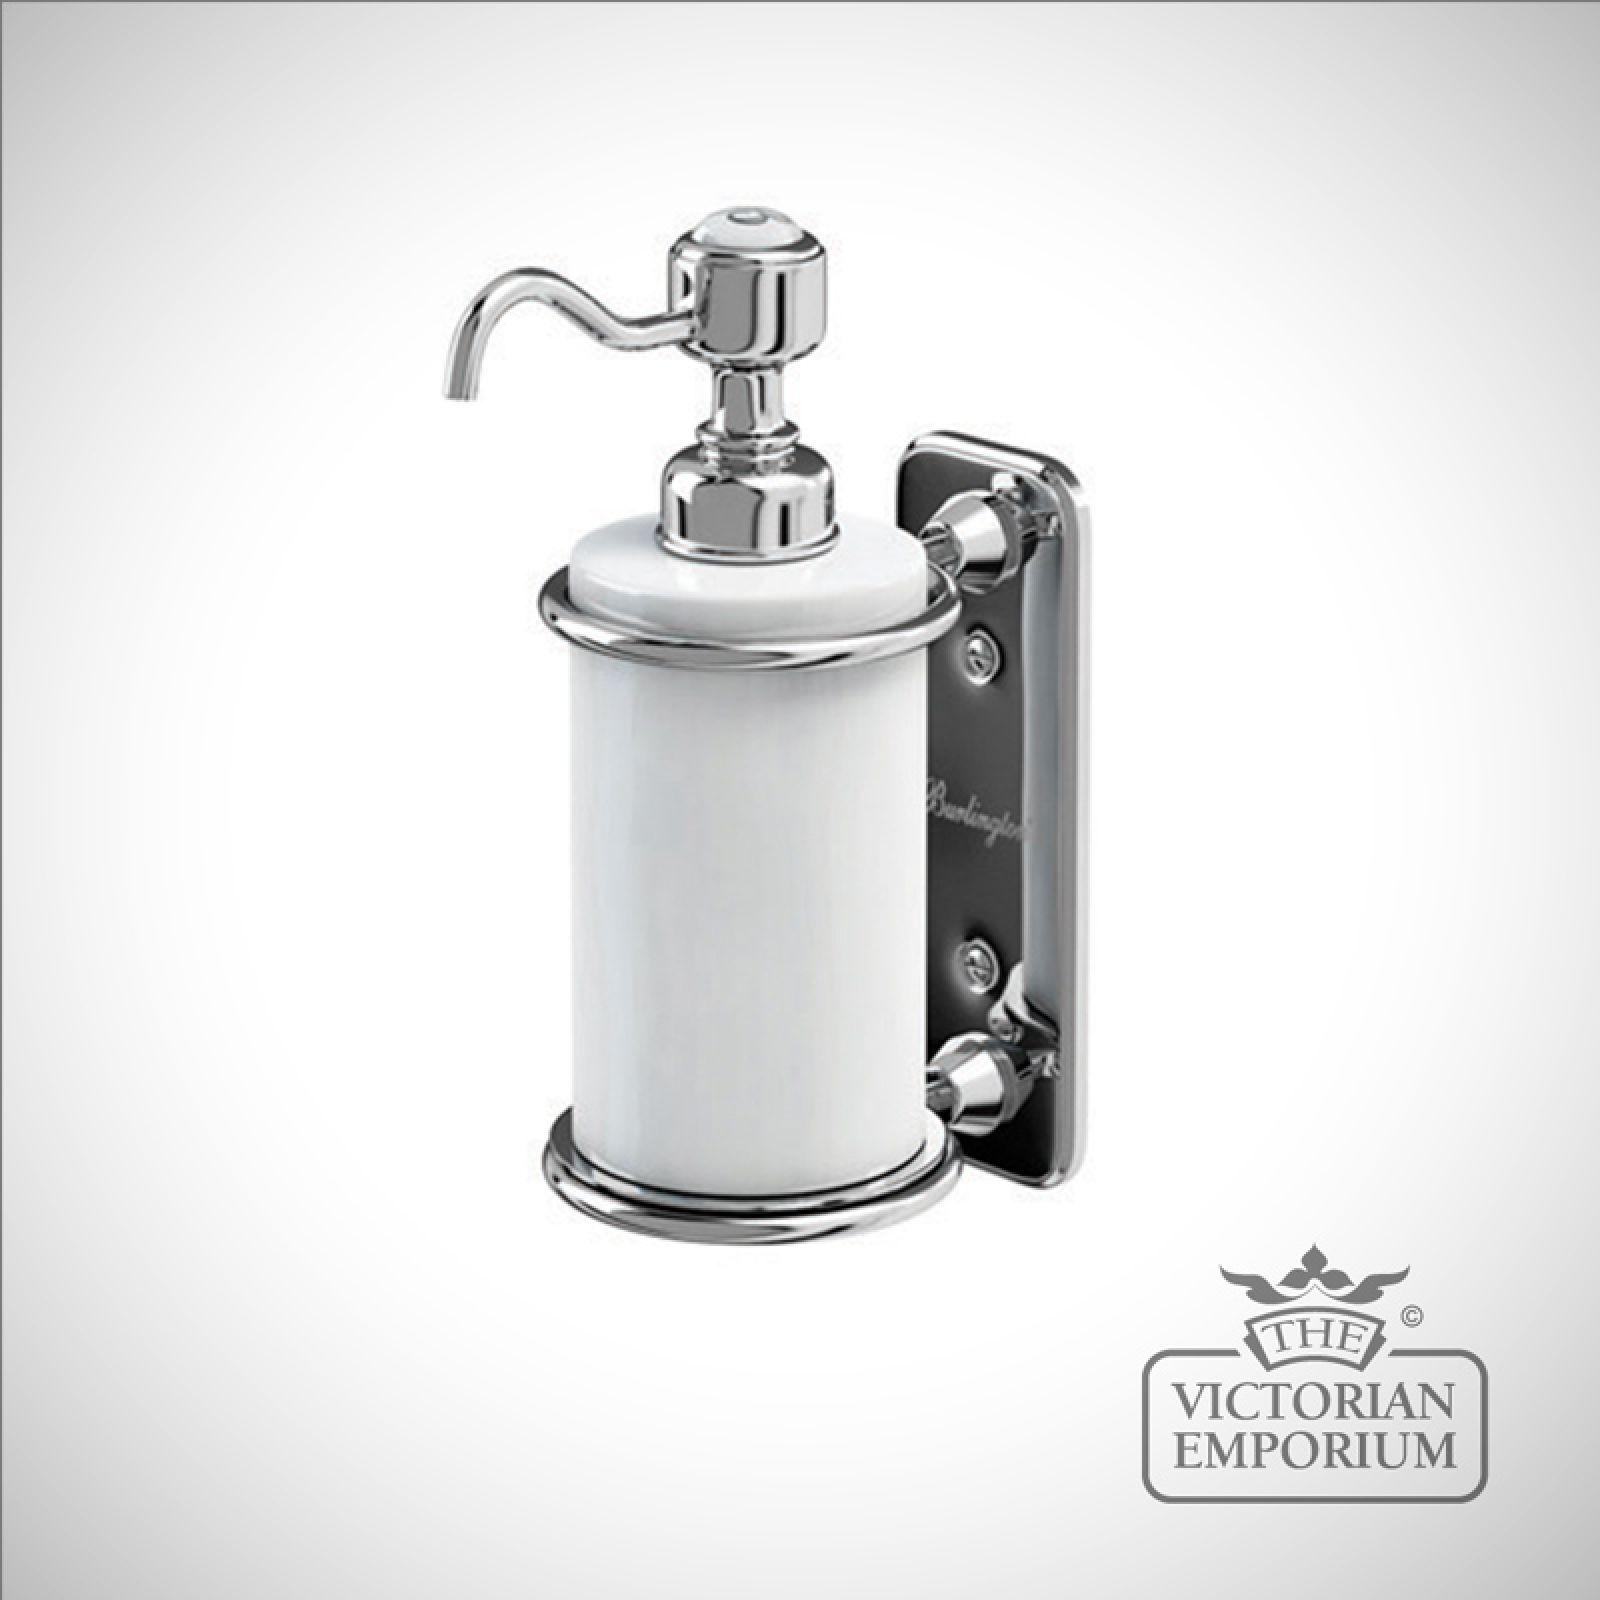 Chrome And Porcelain Soap Dispenser Bathroom Accessories